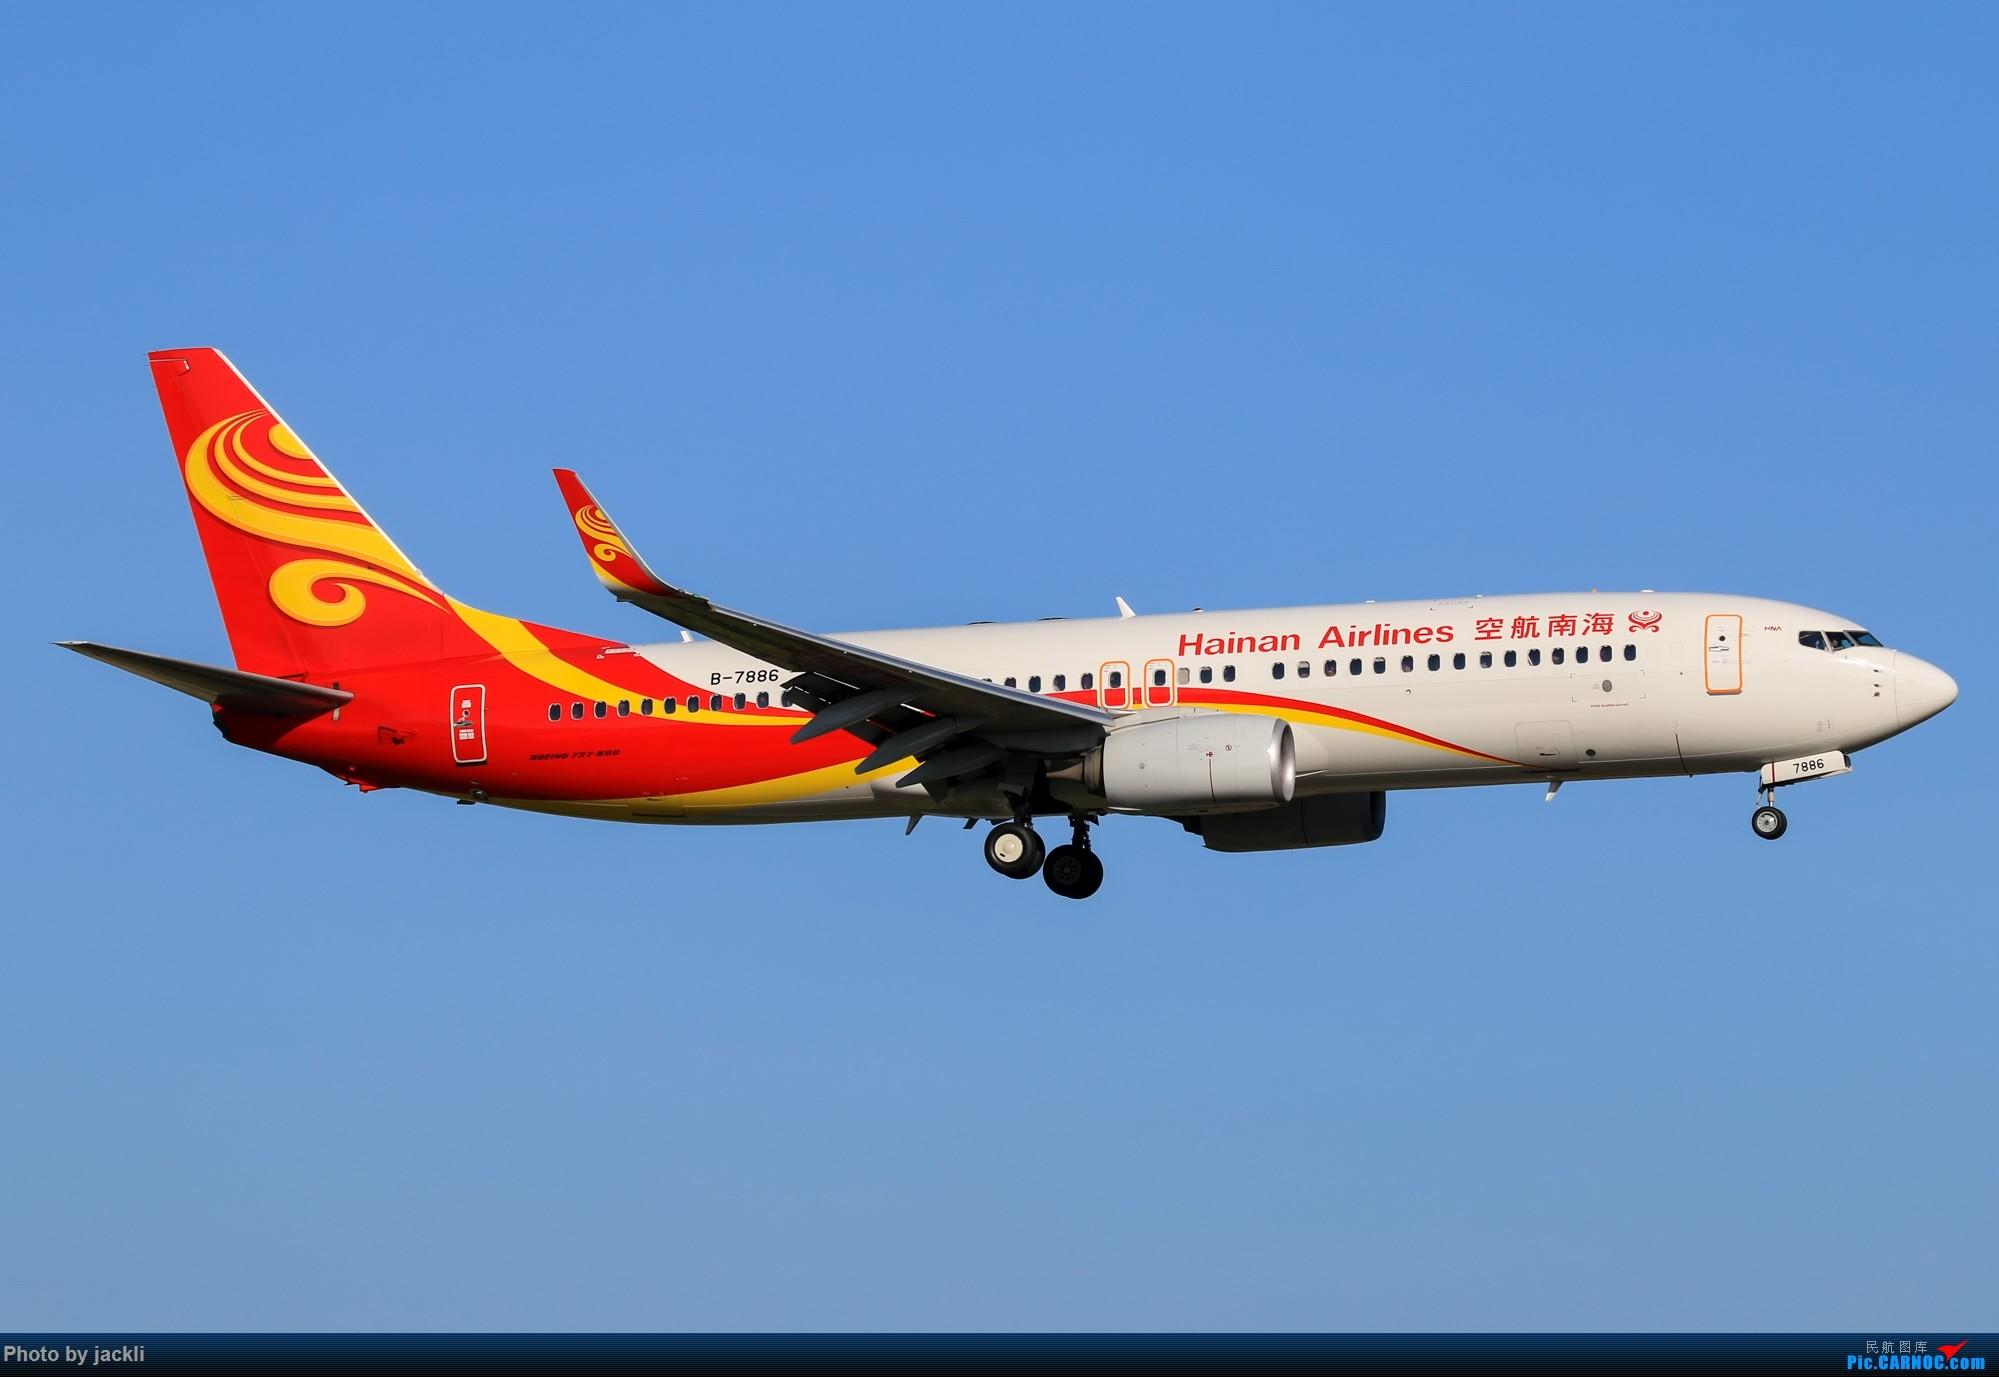 Re:[原创]【JackLi】抓住好天的尾巴~川航330在珠海训练~ BOEING 737-800 B-7886 中国珠海金湾机场